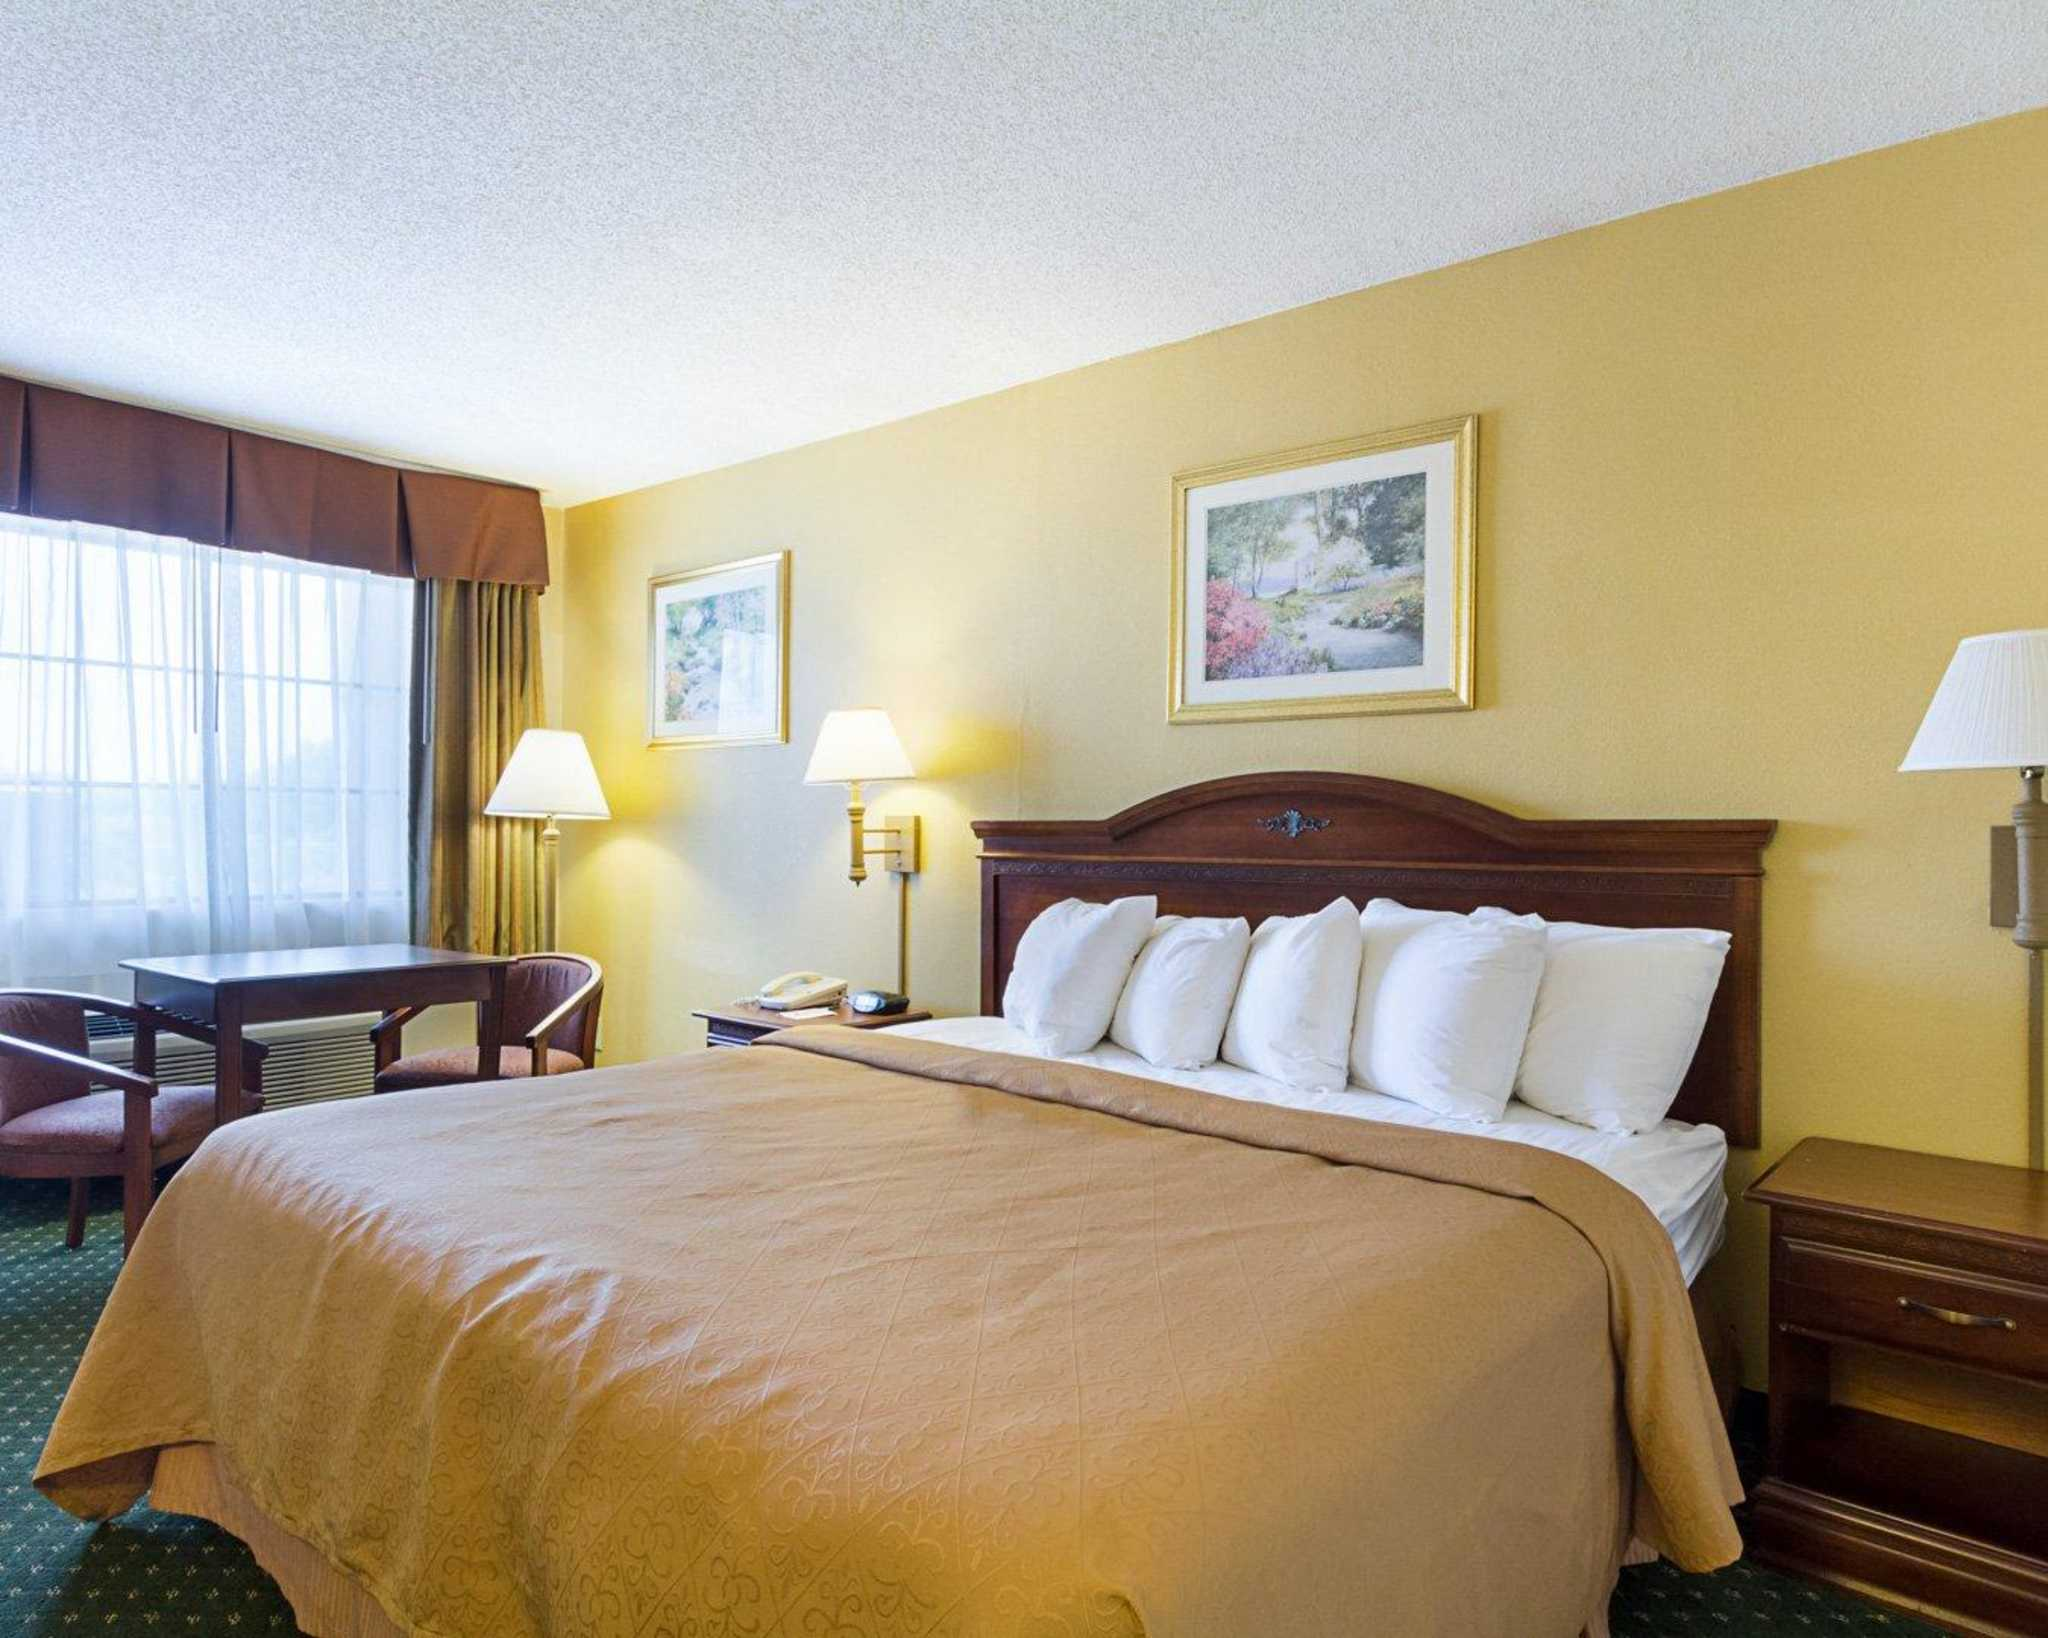 Quality Inn & Suites Southwest image 4